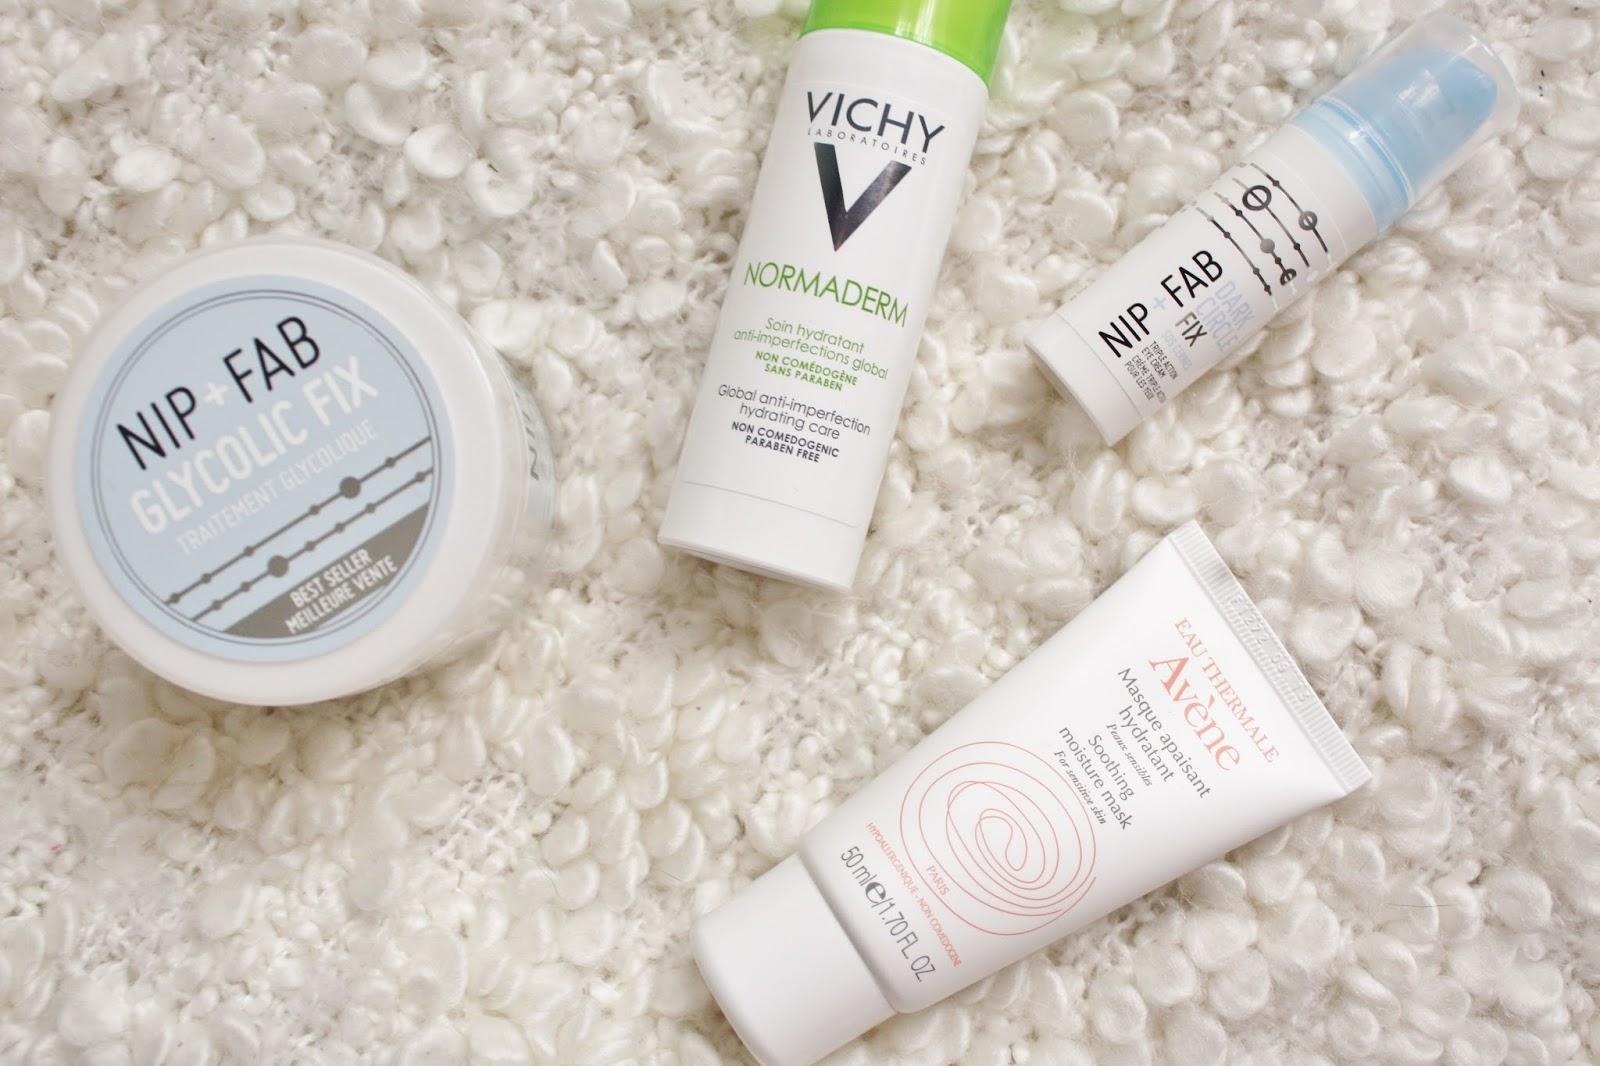 Autumn Skincare Additions - Nip + Fab, Vichy and Avene